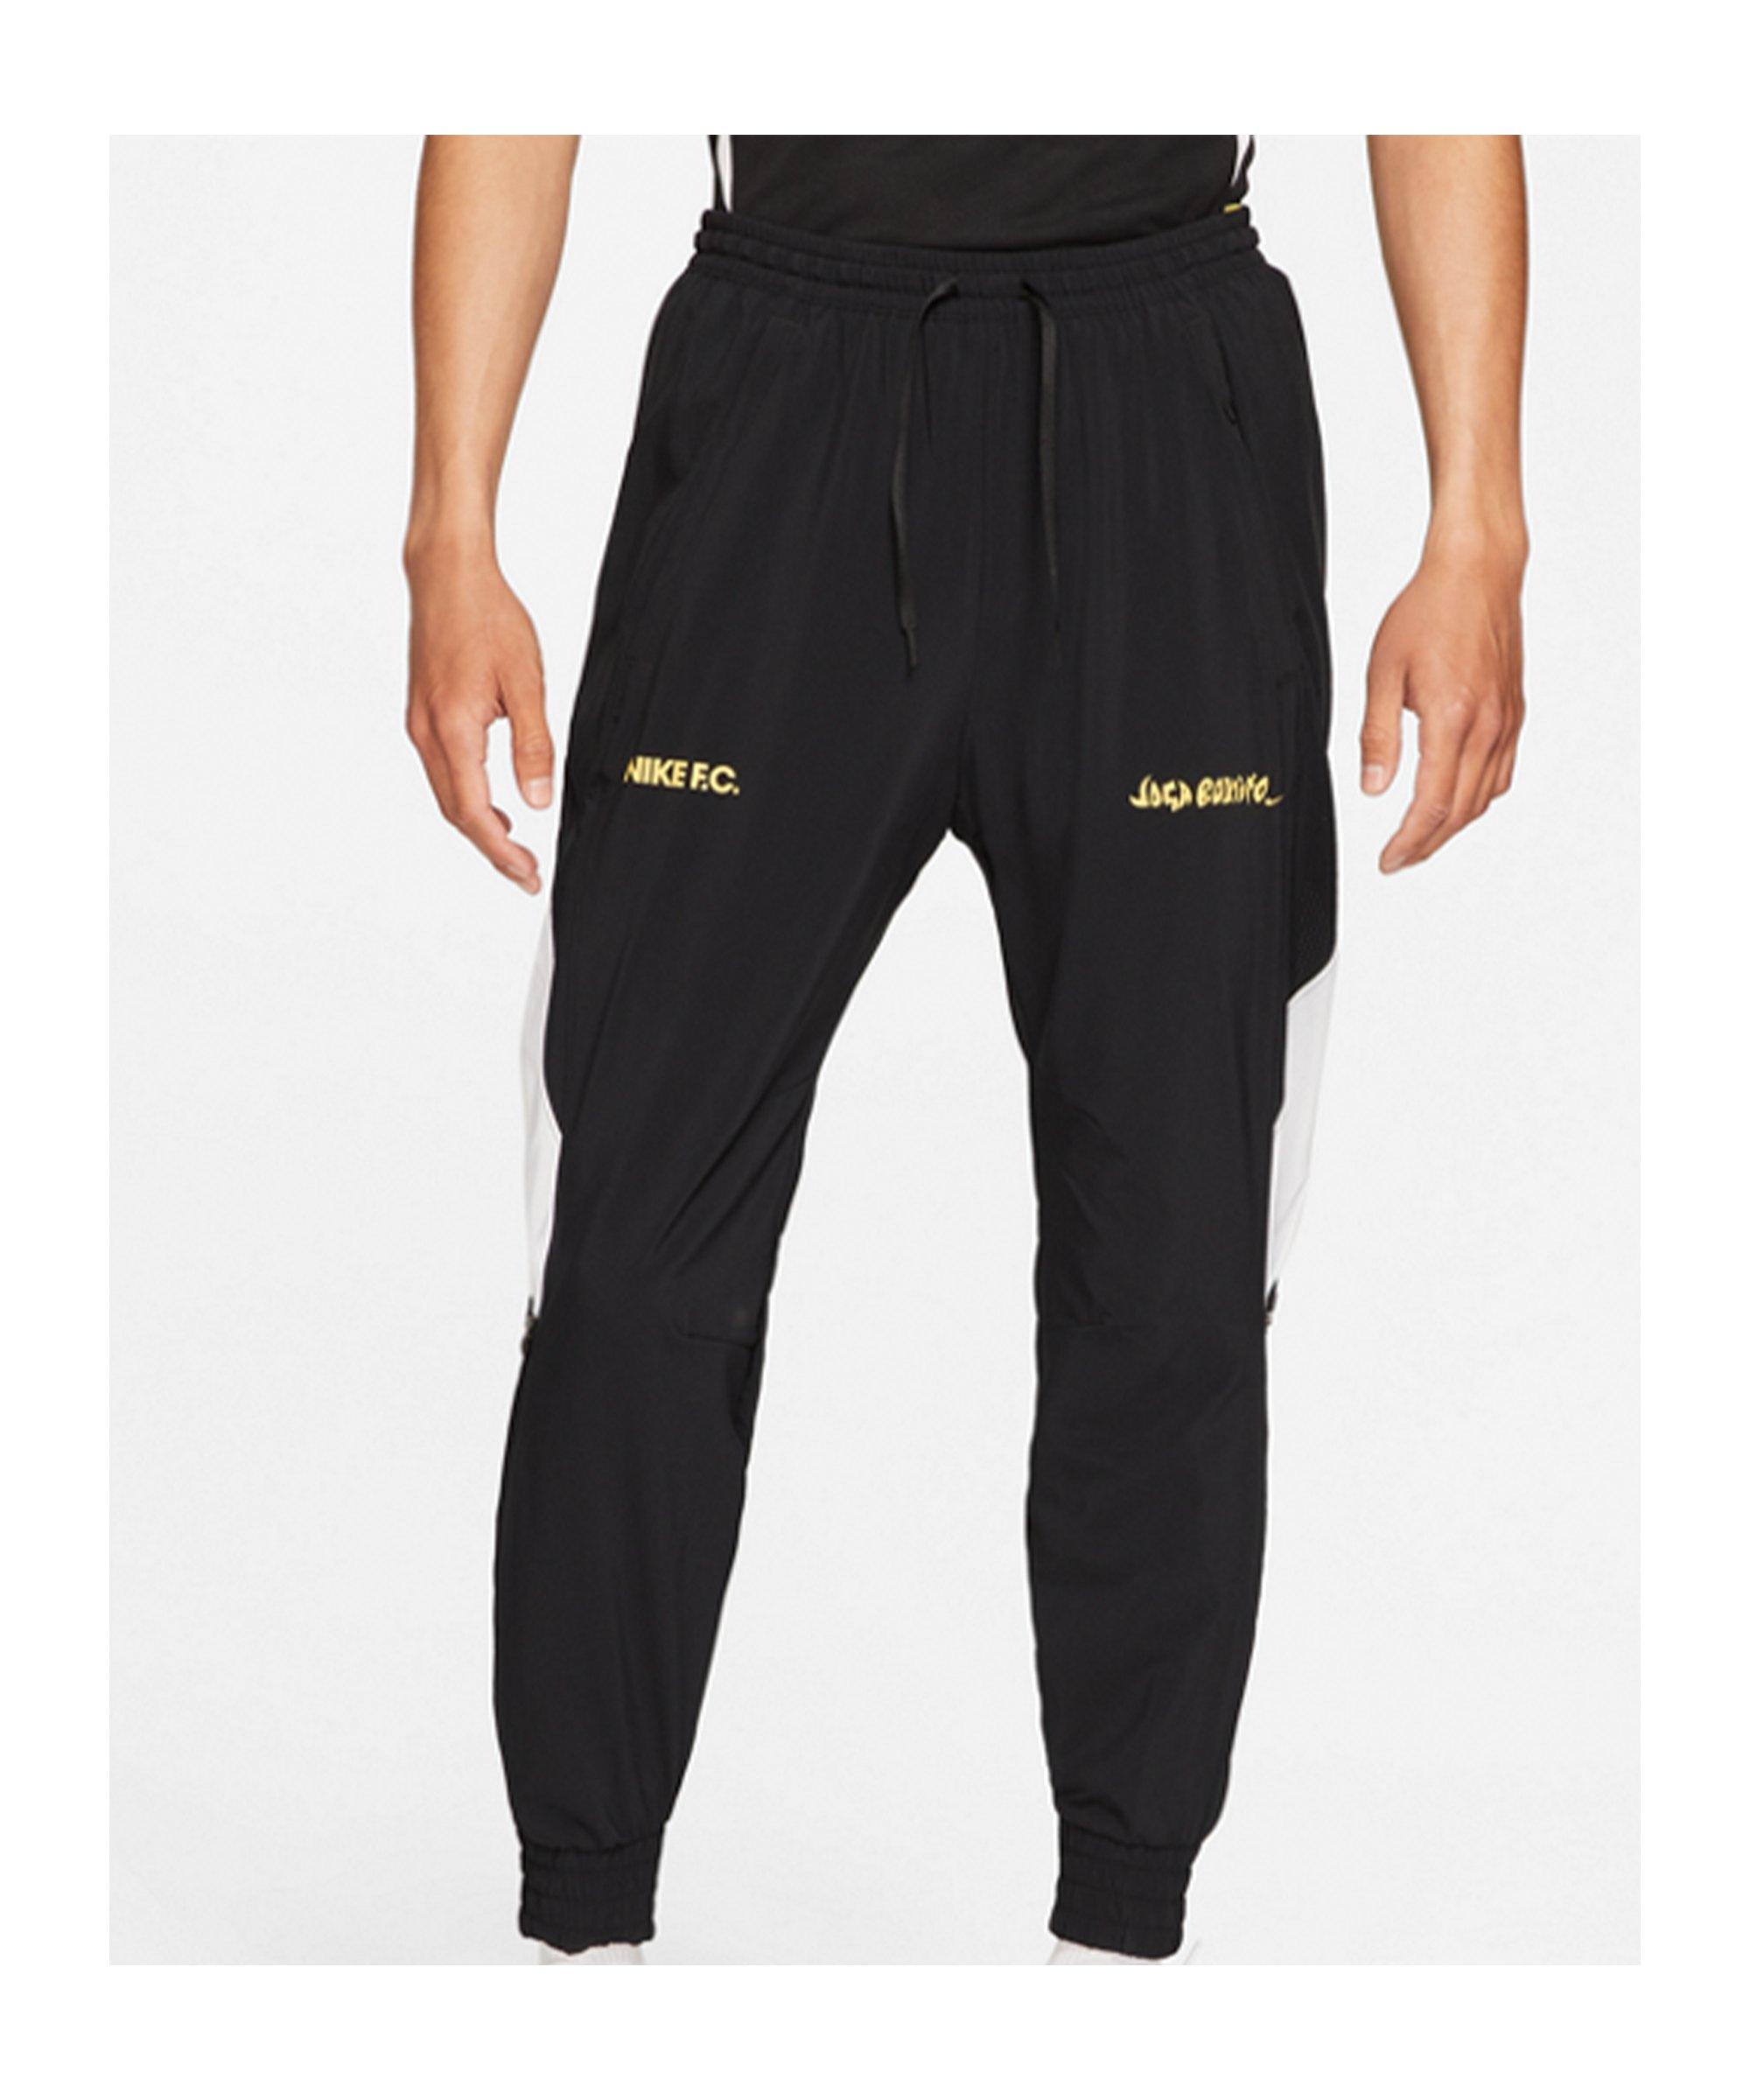 Nike F.C. Joga Bonito Woven Hose Schwarz F010 - schwarz